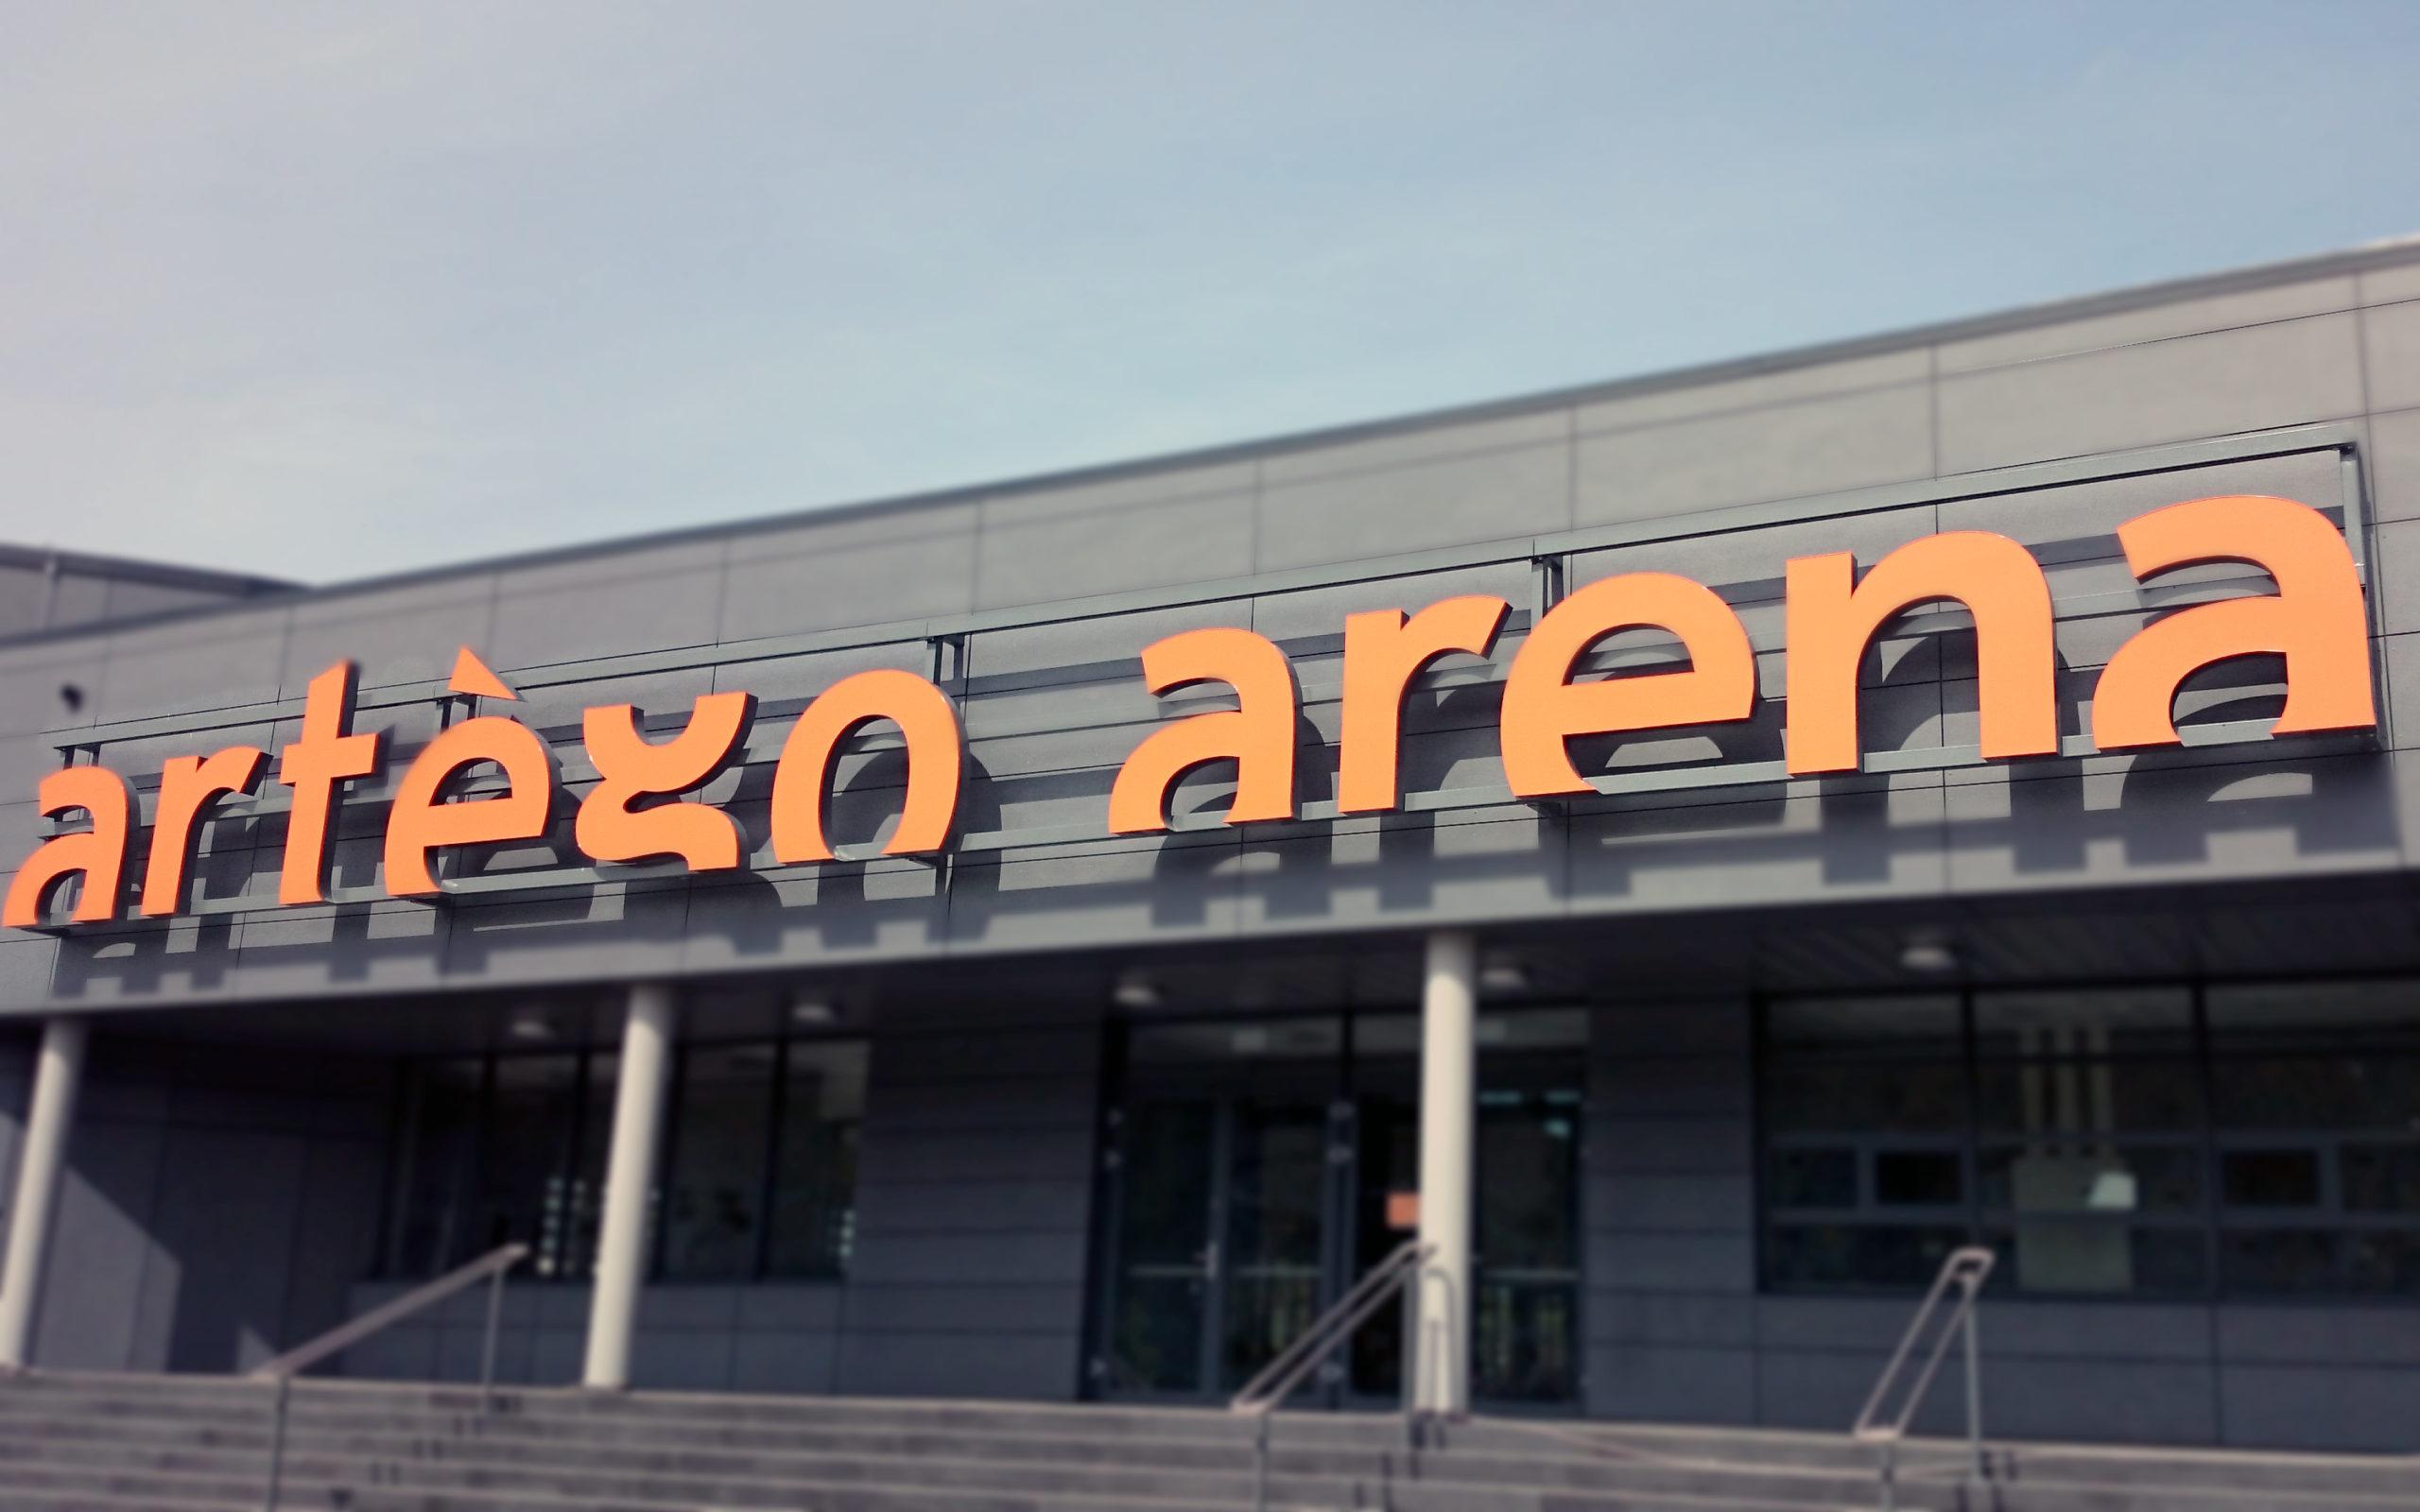 Profuturo Producent Reklam artego arena